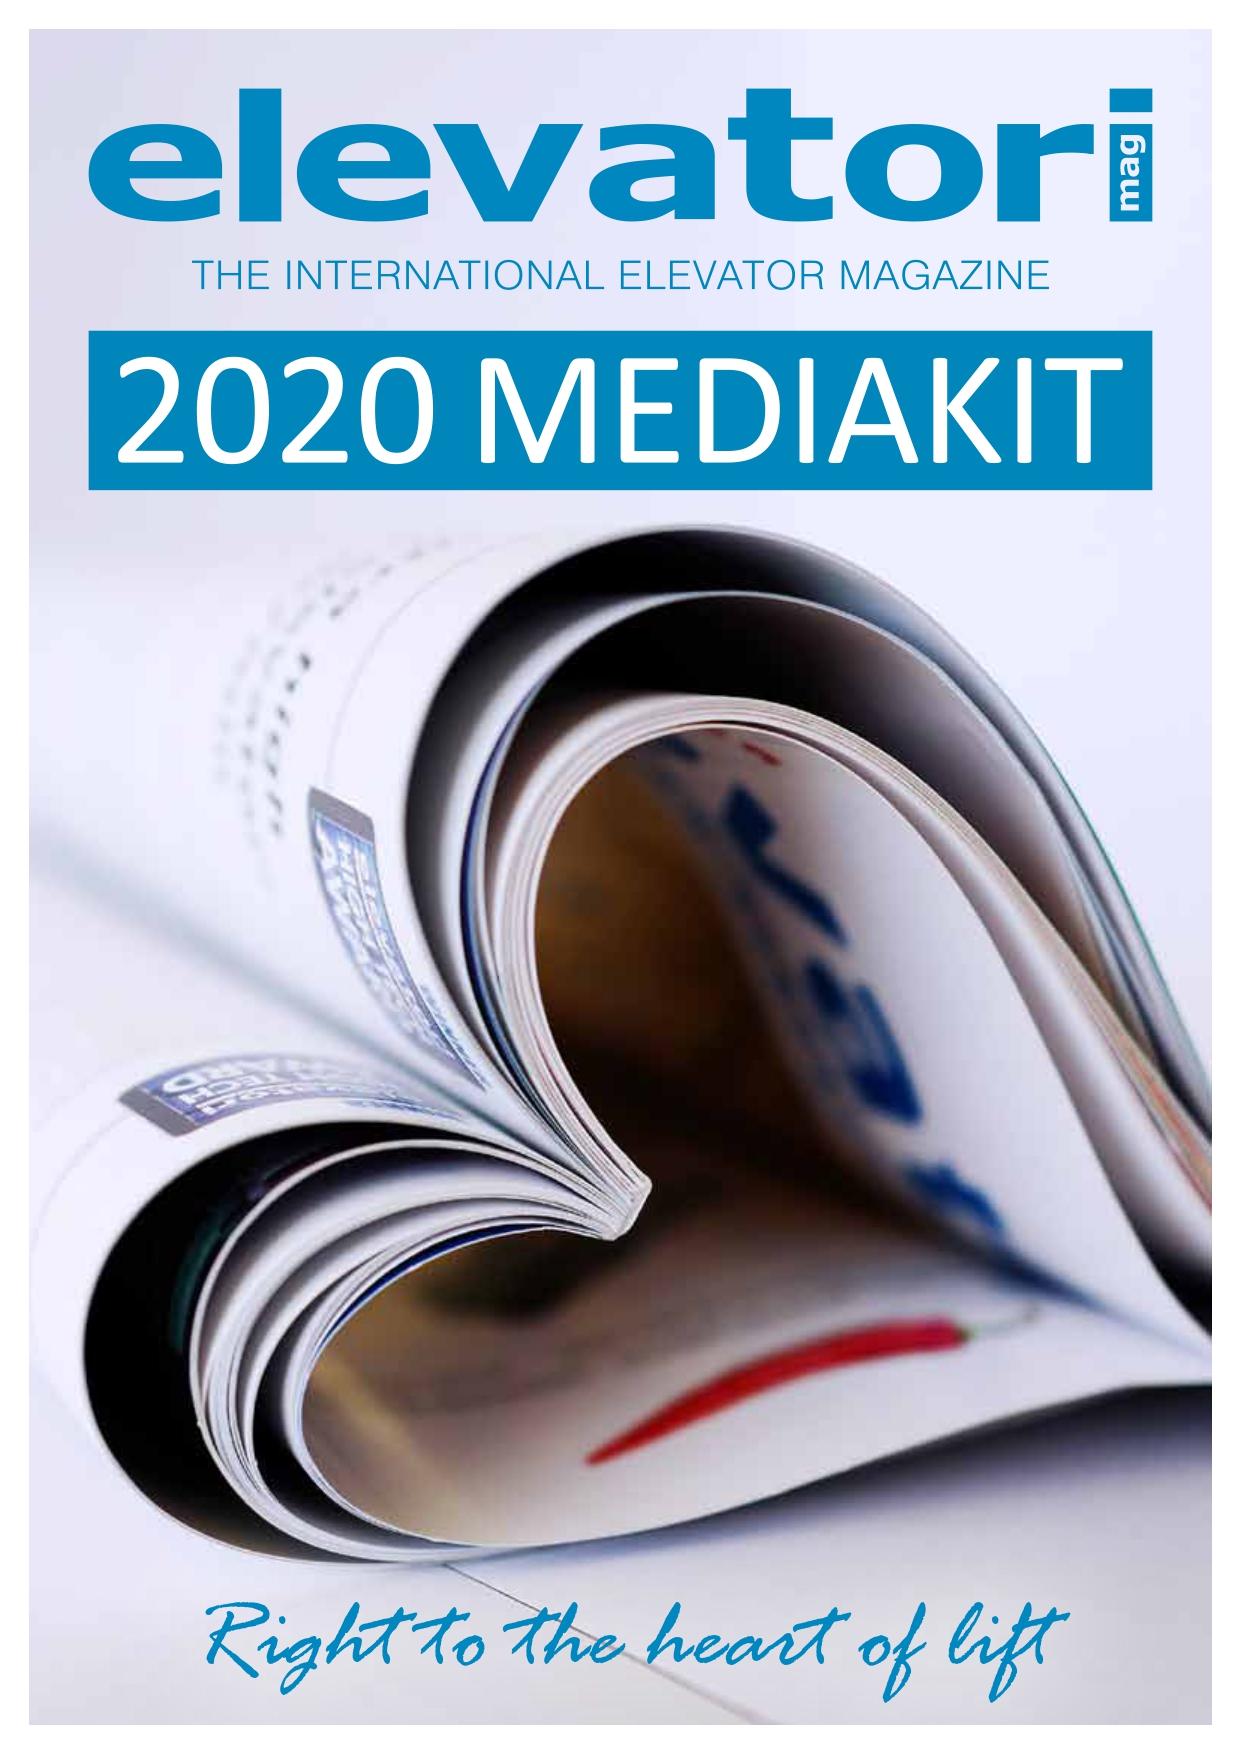 elevatori-mediakit-2020_pages-to-jpg-0001